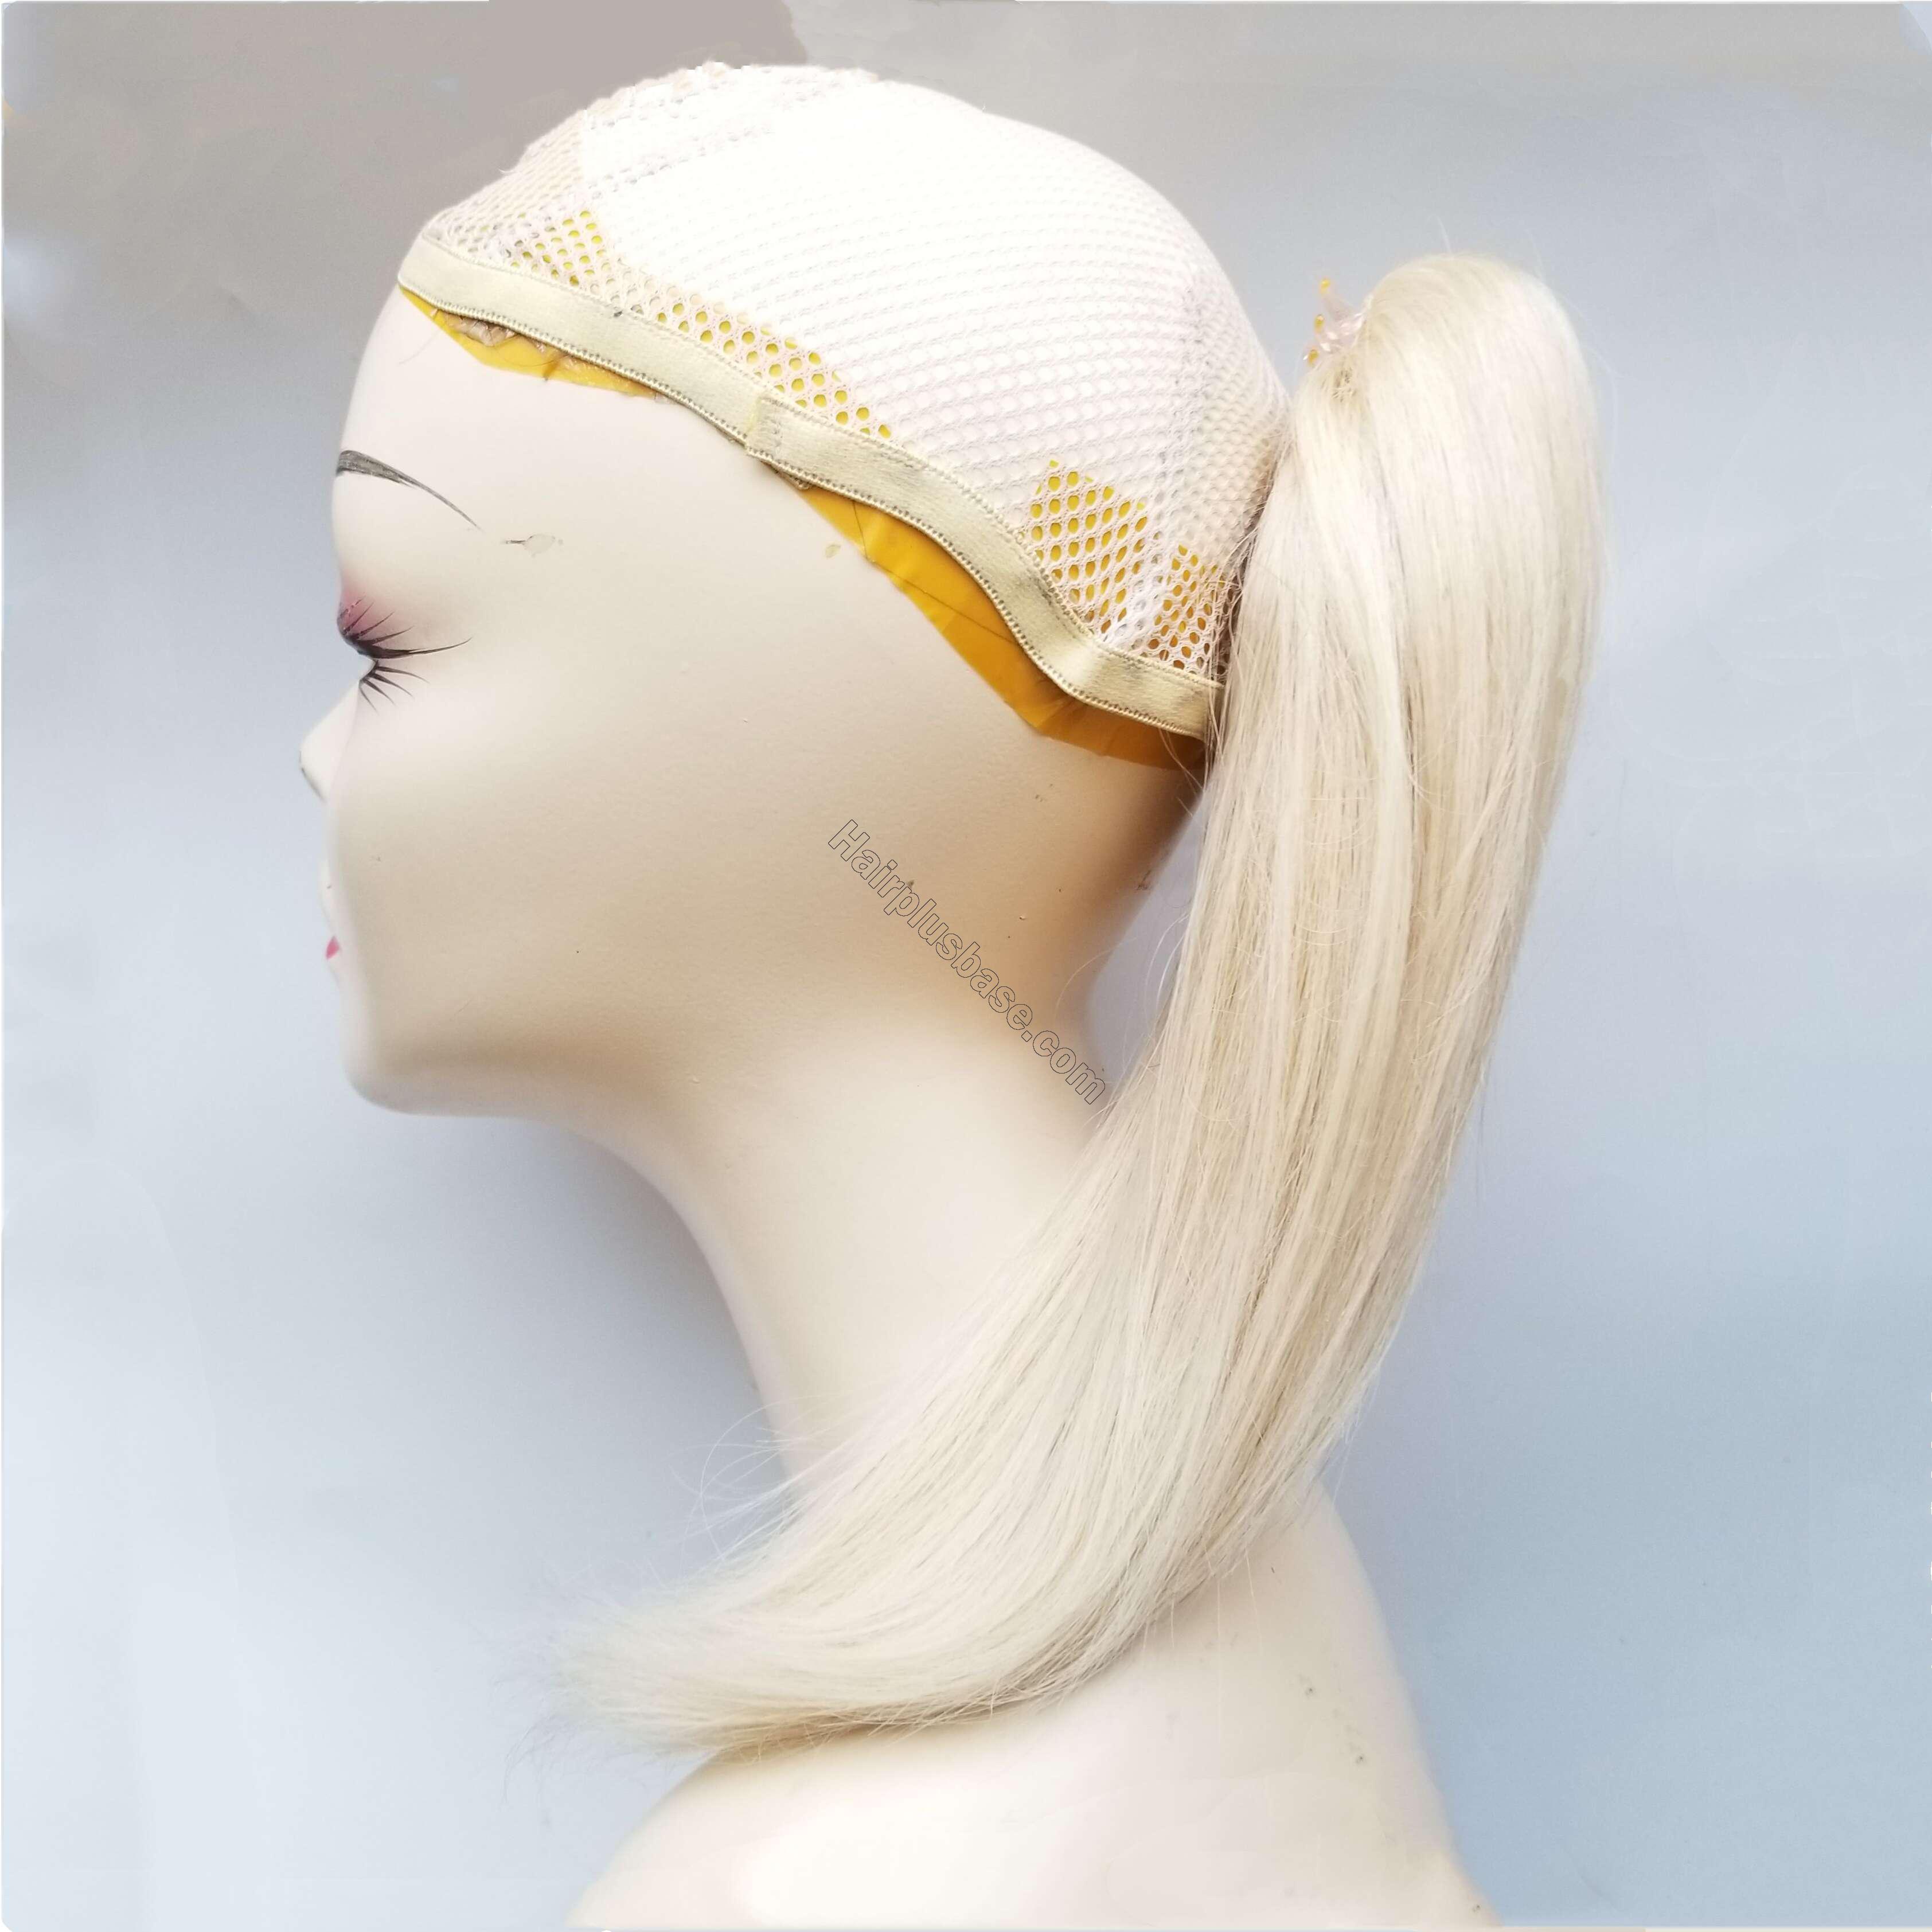 8 - 30 Inch Claw Ponytail Extension Human Hair #613 Bleach Blonde 5